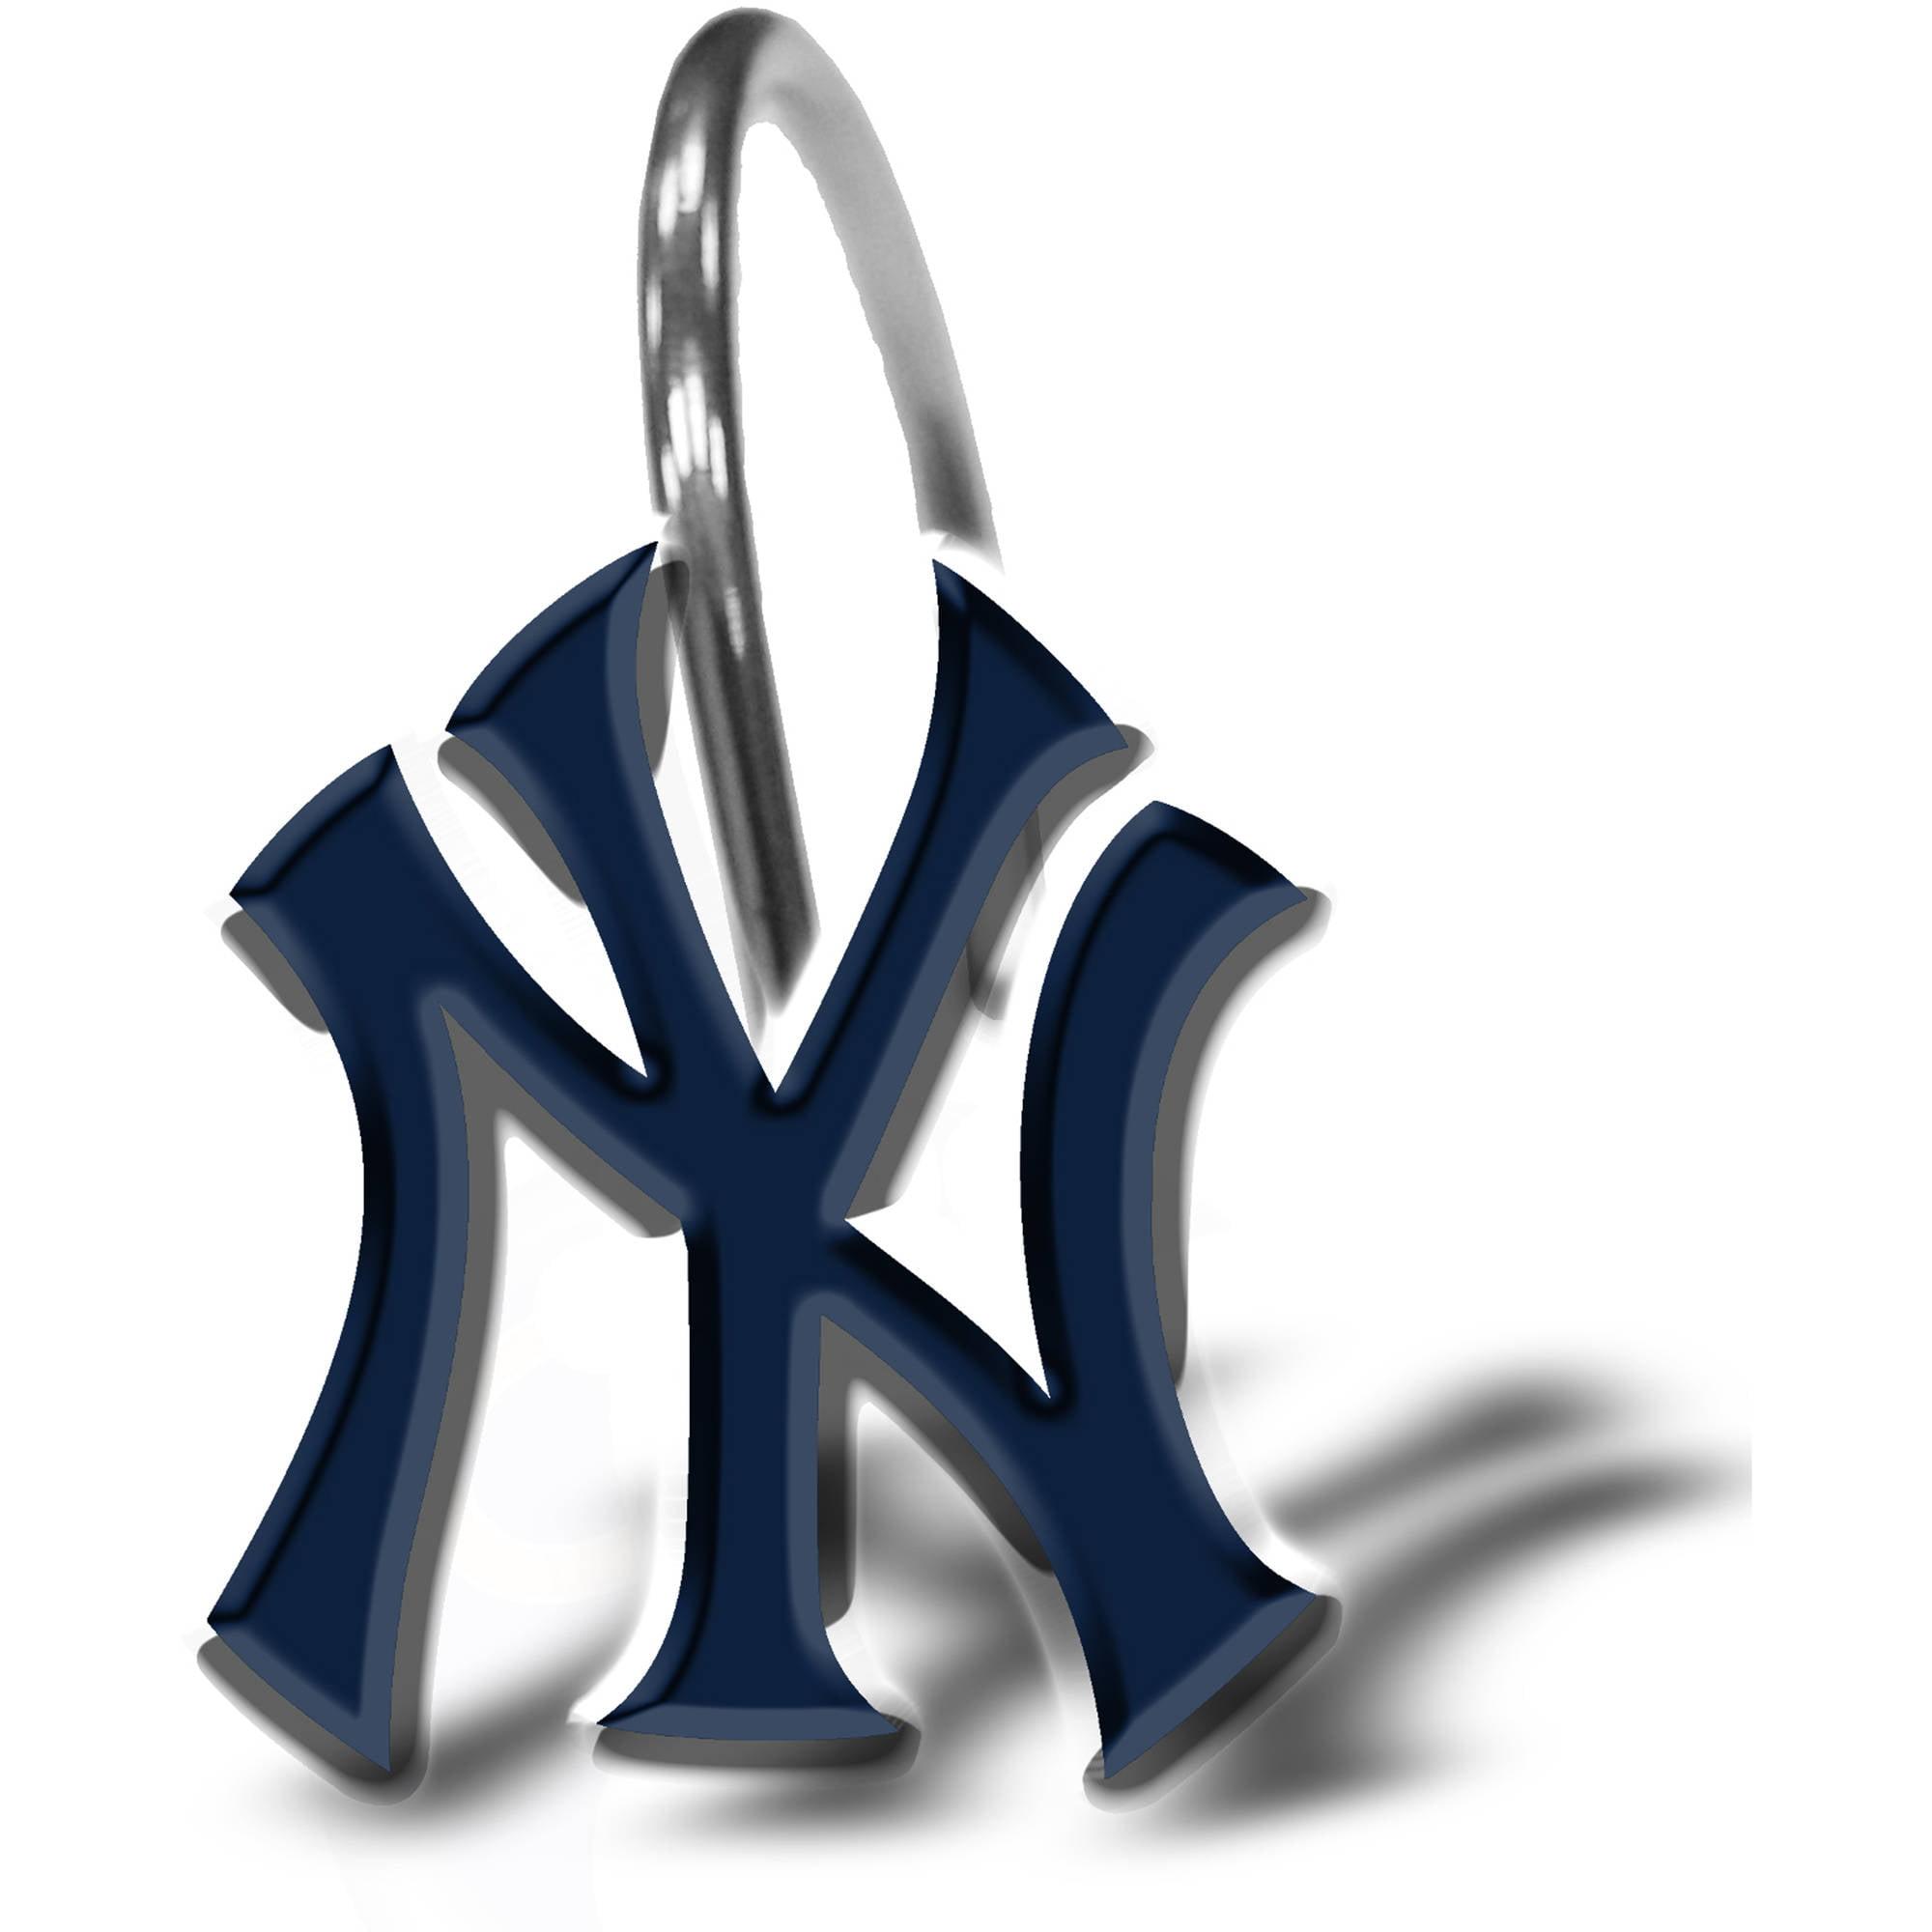 Mlb new york yankees 12 piece shower curtain ring set walmart biocorpaavc Image collections